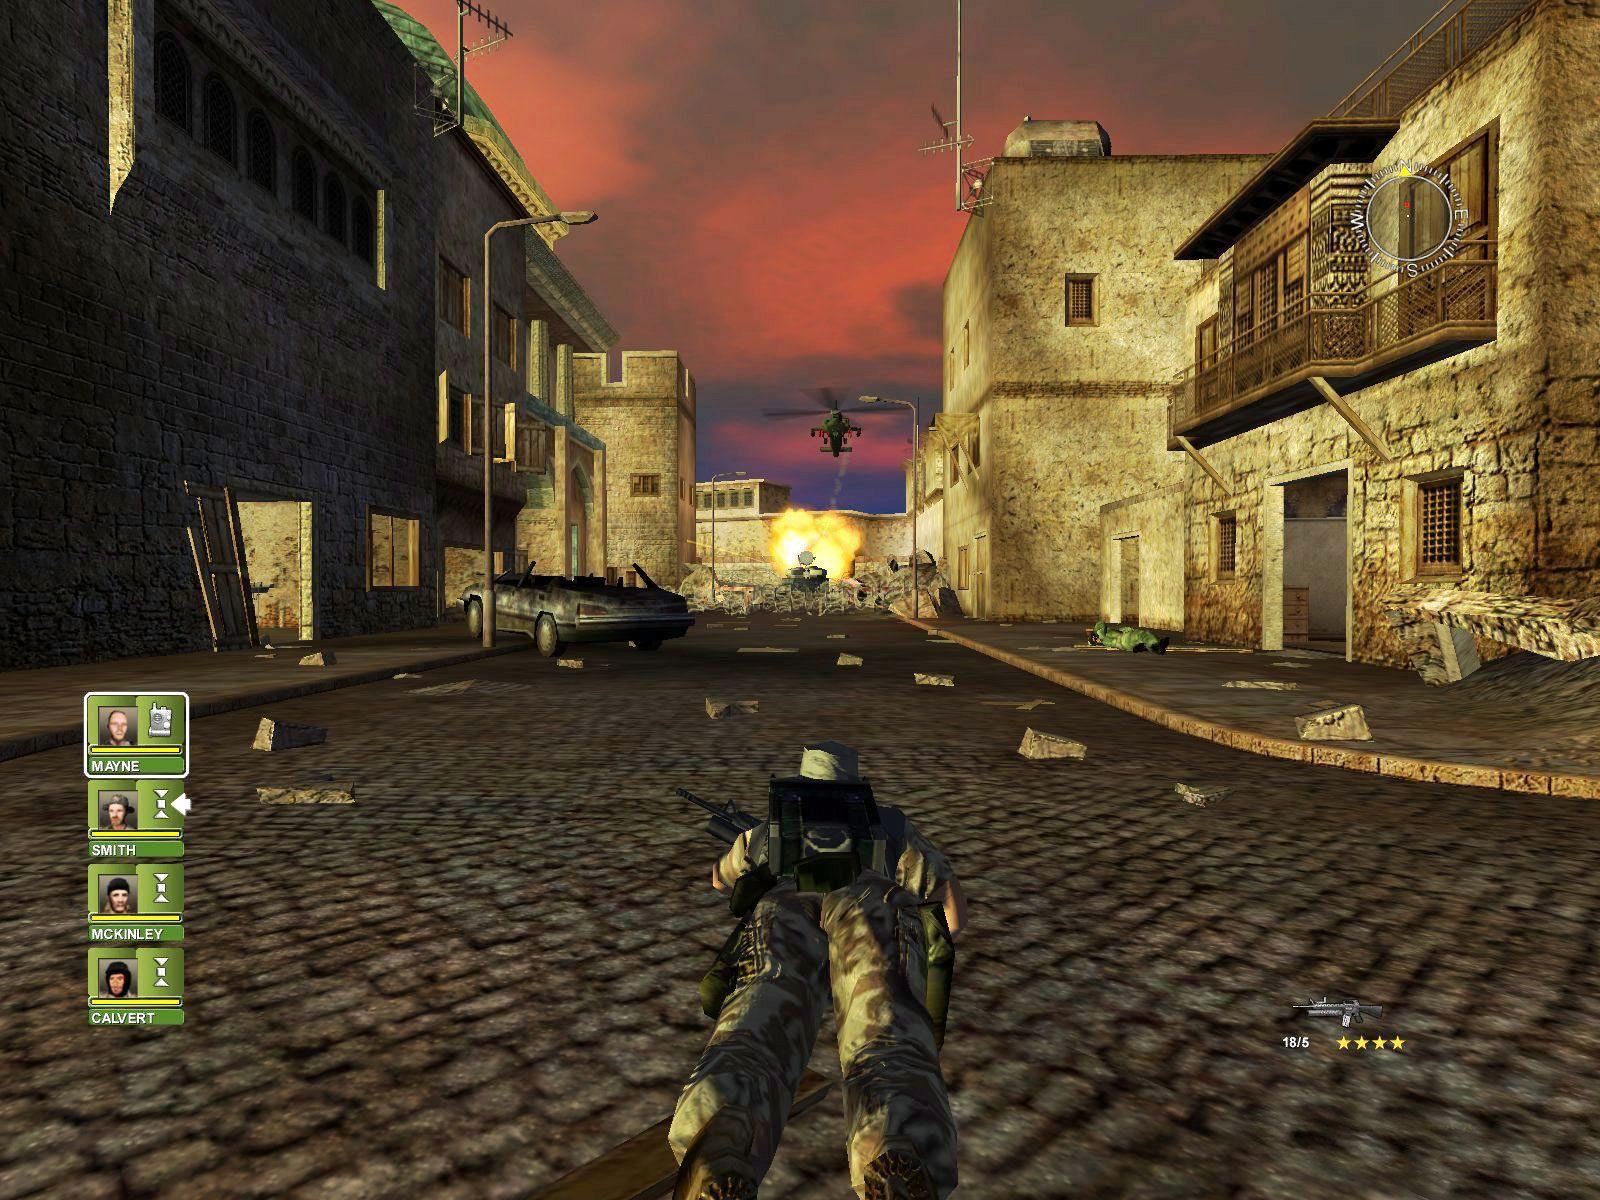 Conflict desert storm 2 full version game download pcgamefreetop.